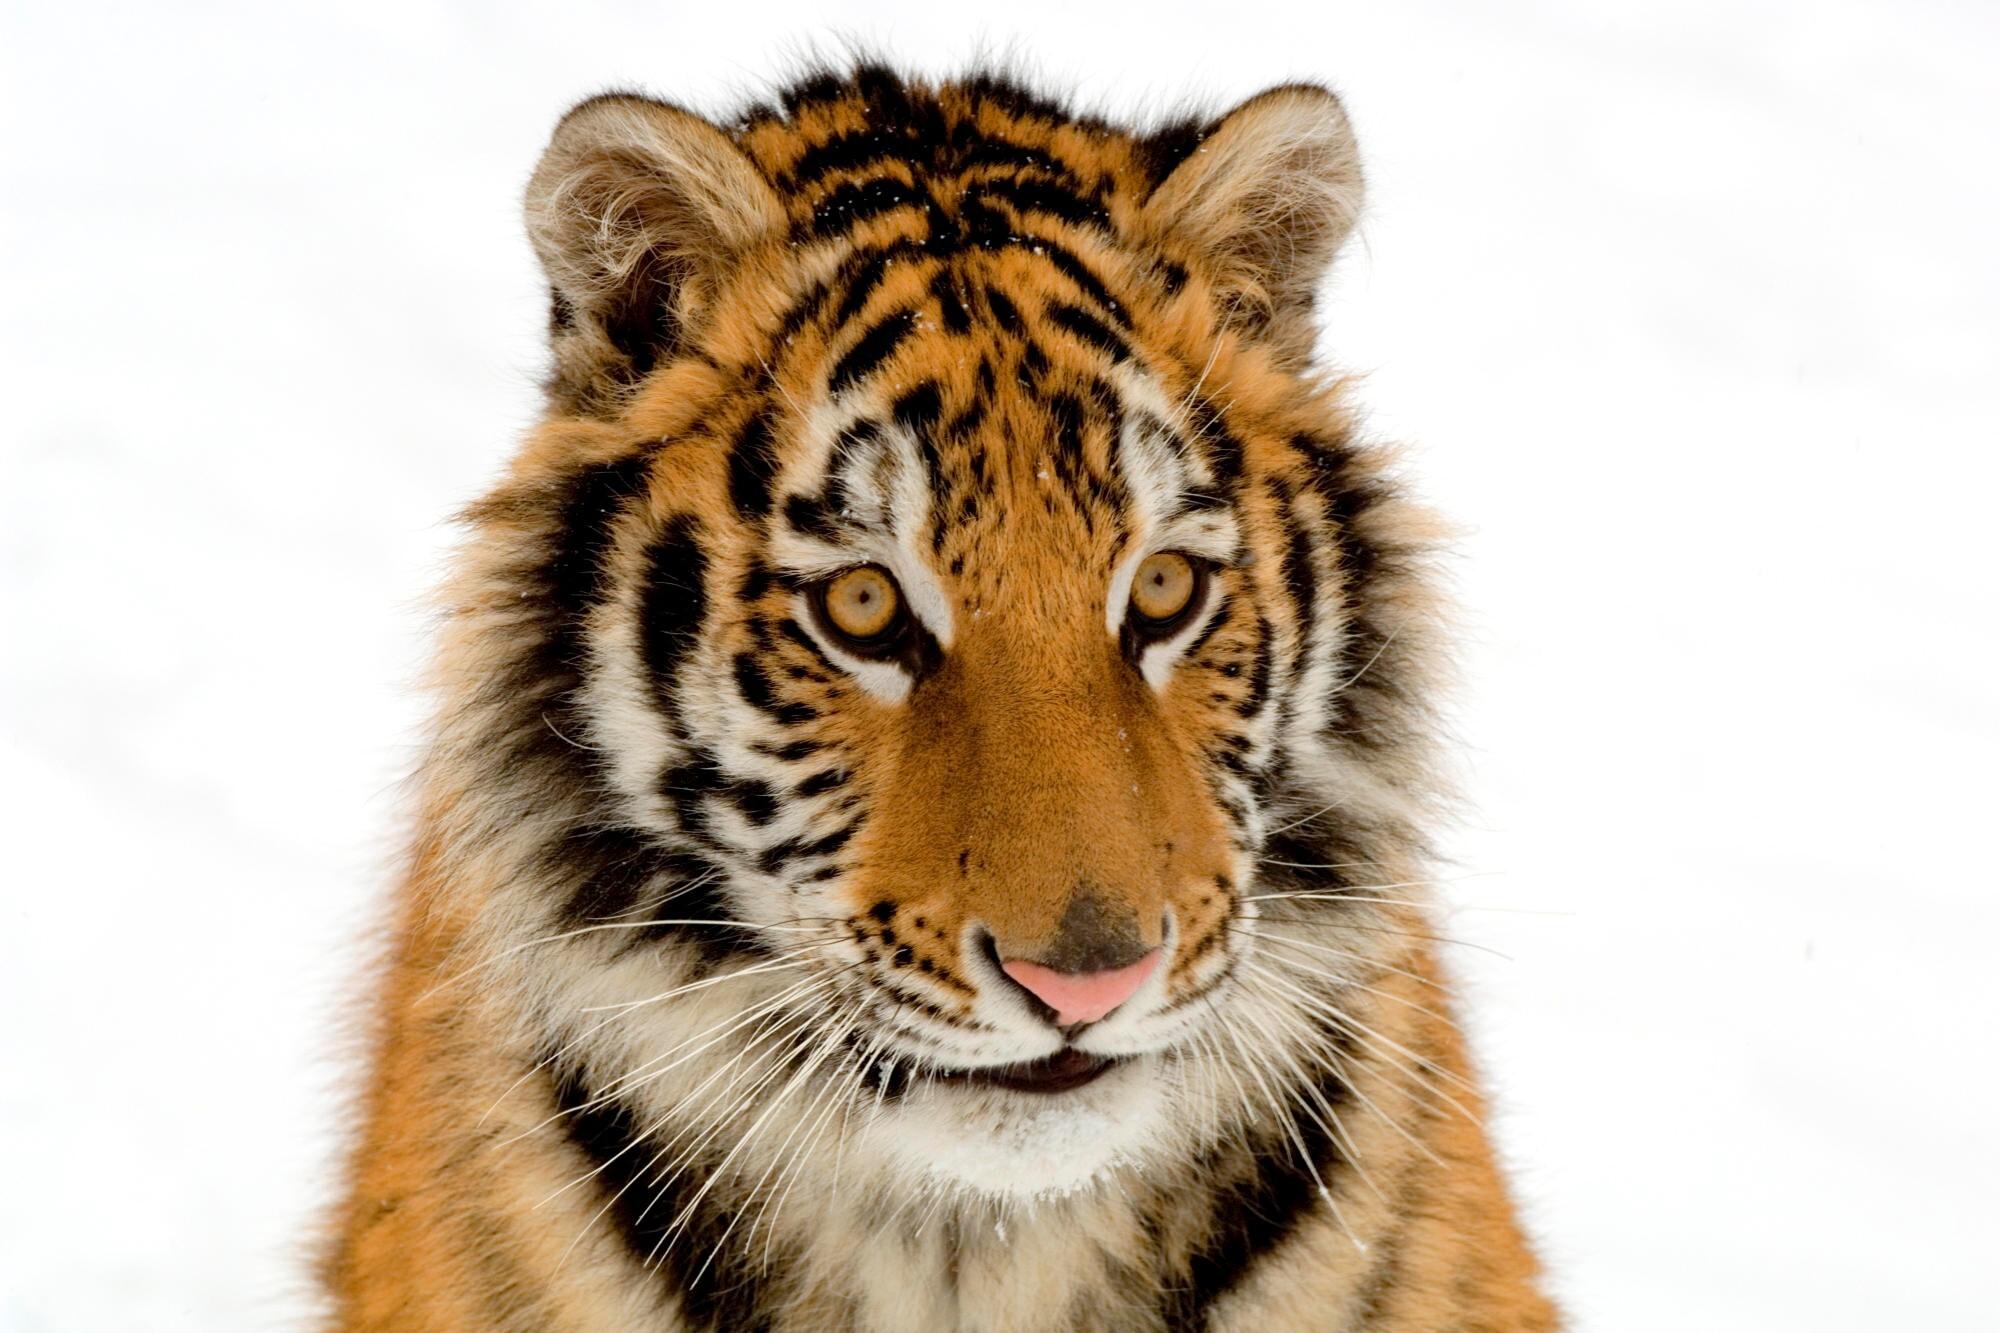 Wild Animal Tiger Image   HD Wallpapers